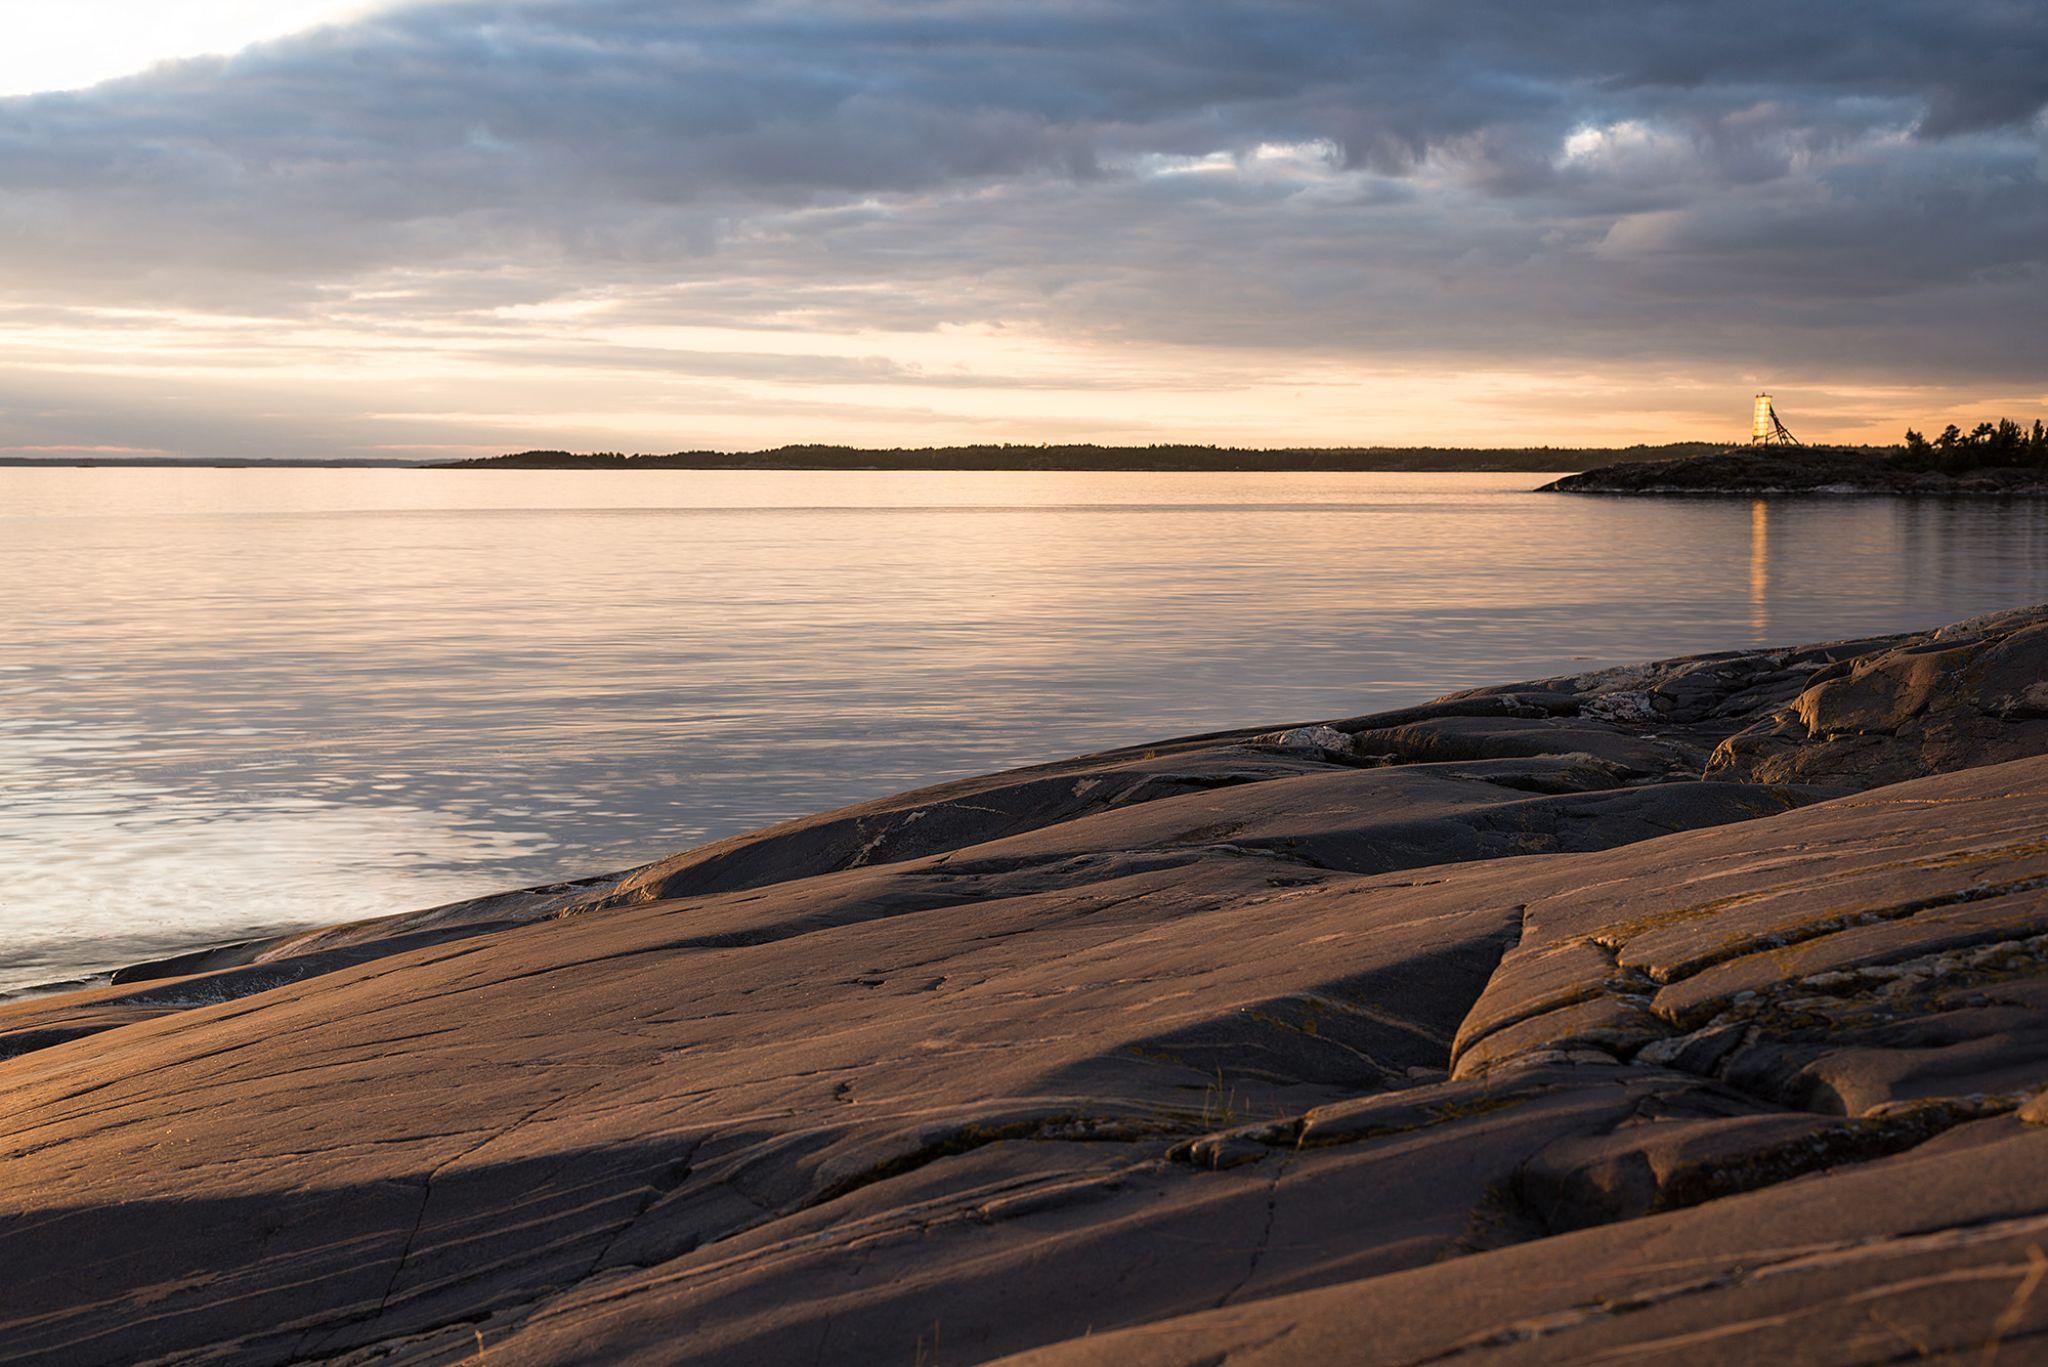 Sunset at Porkkala cape. by Soili Stenroos